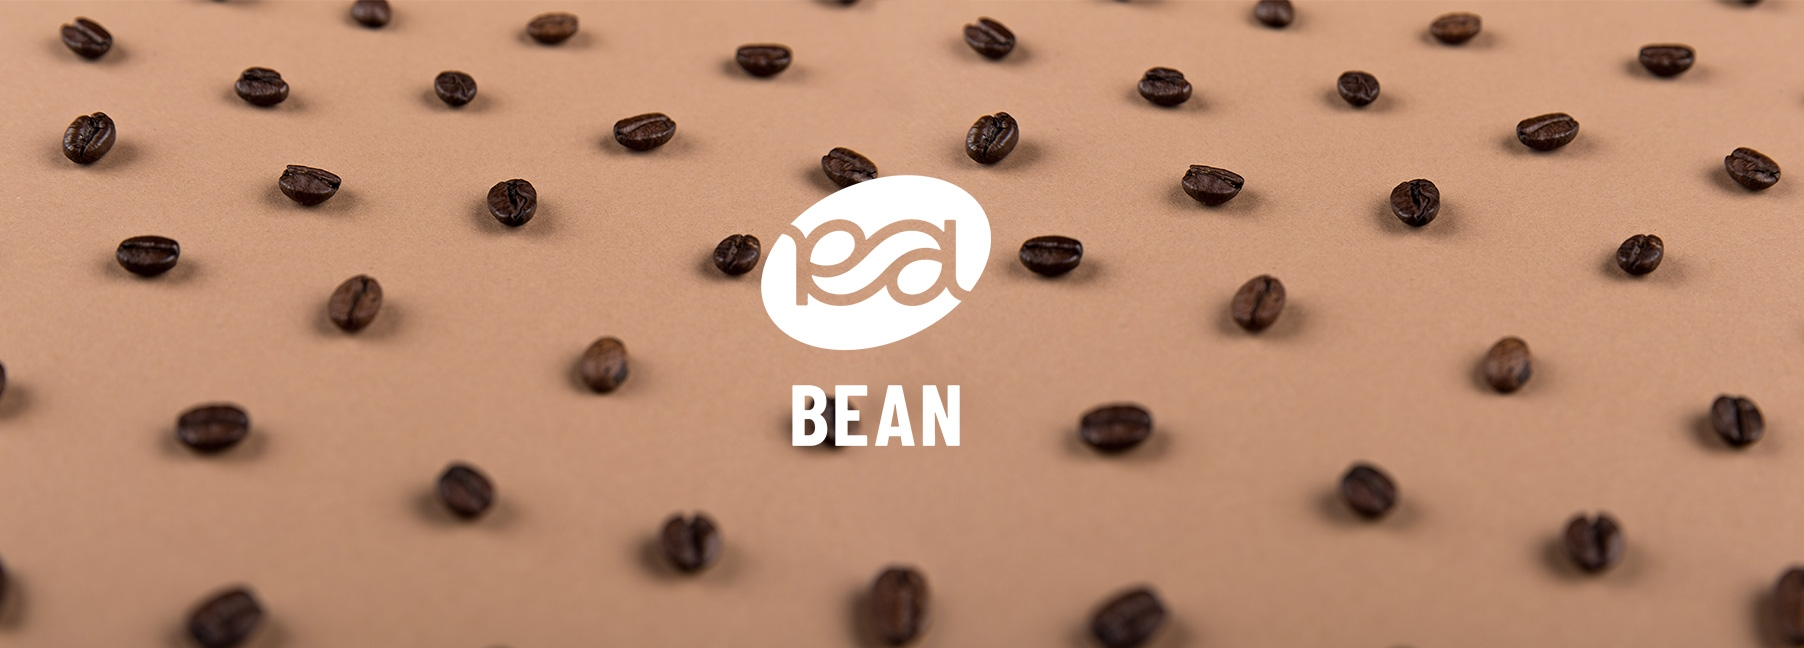 RealBean